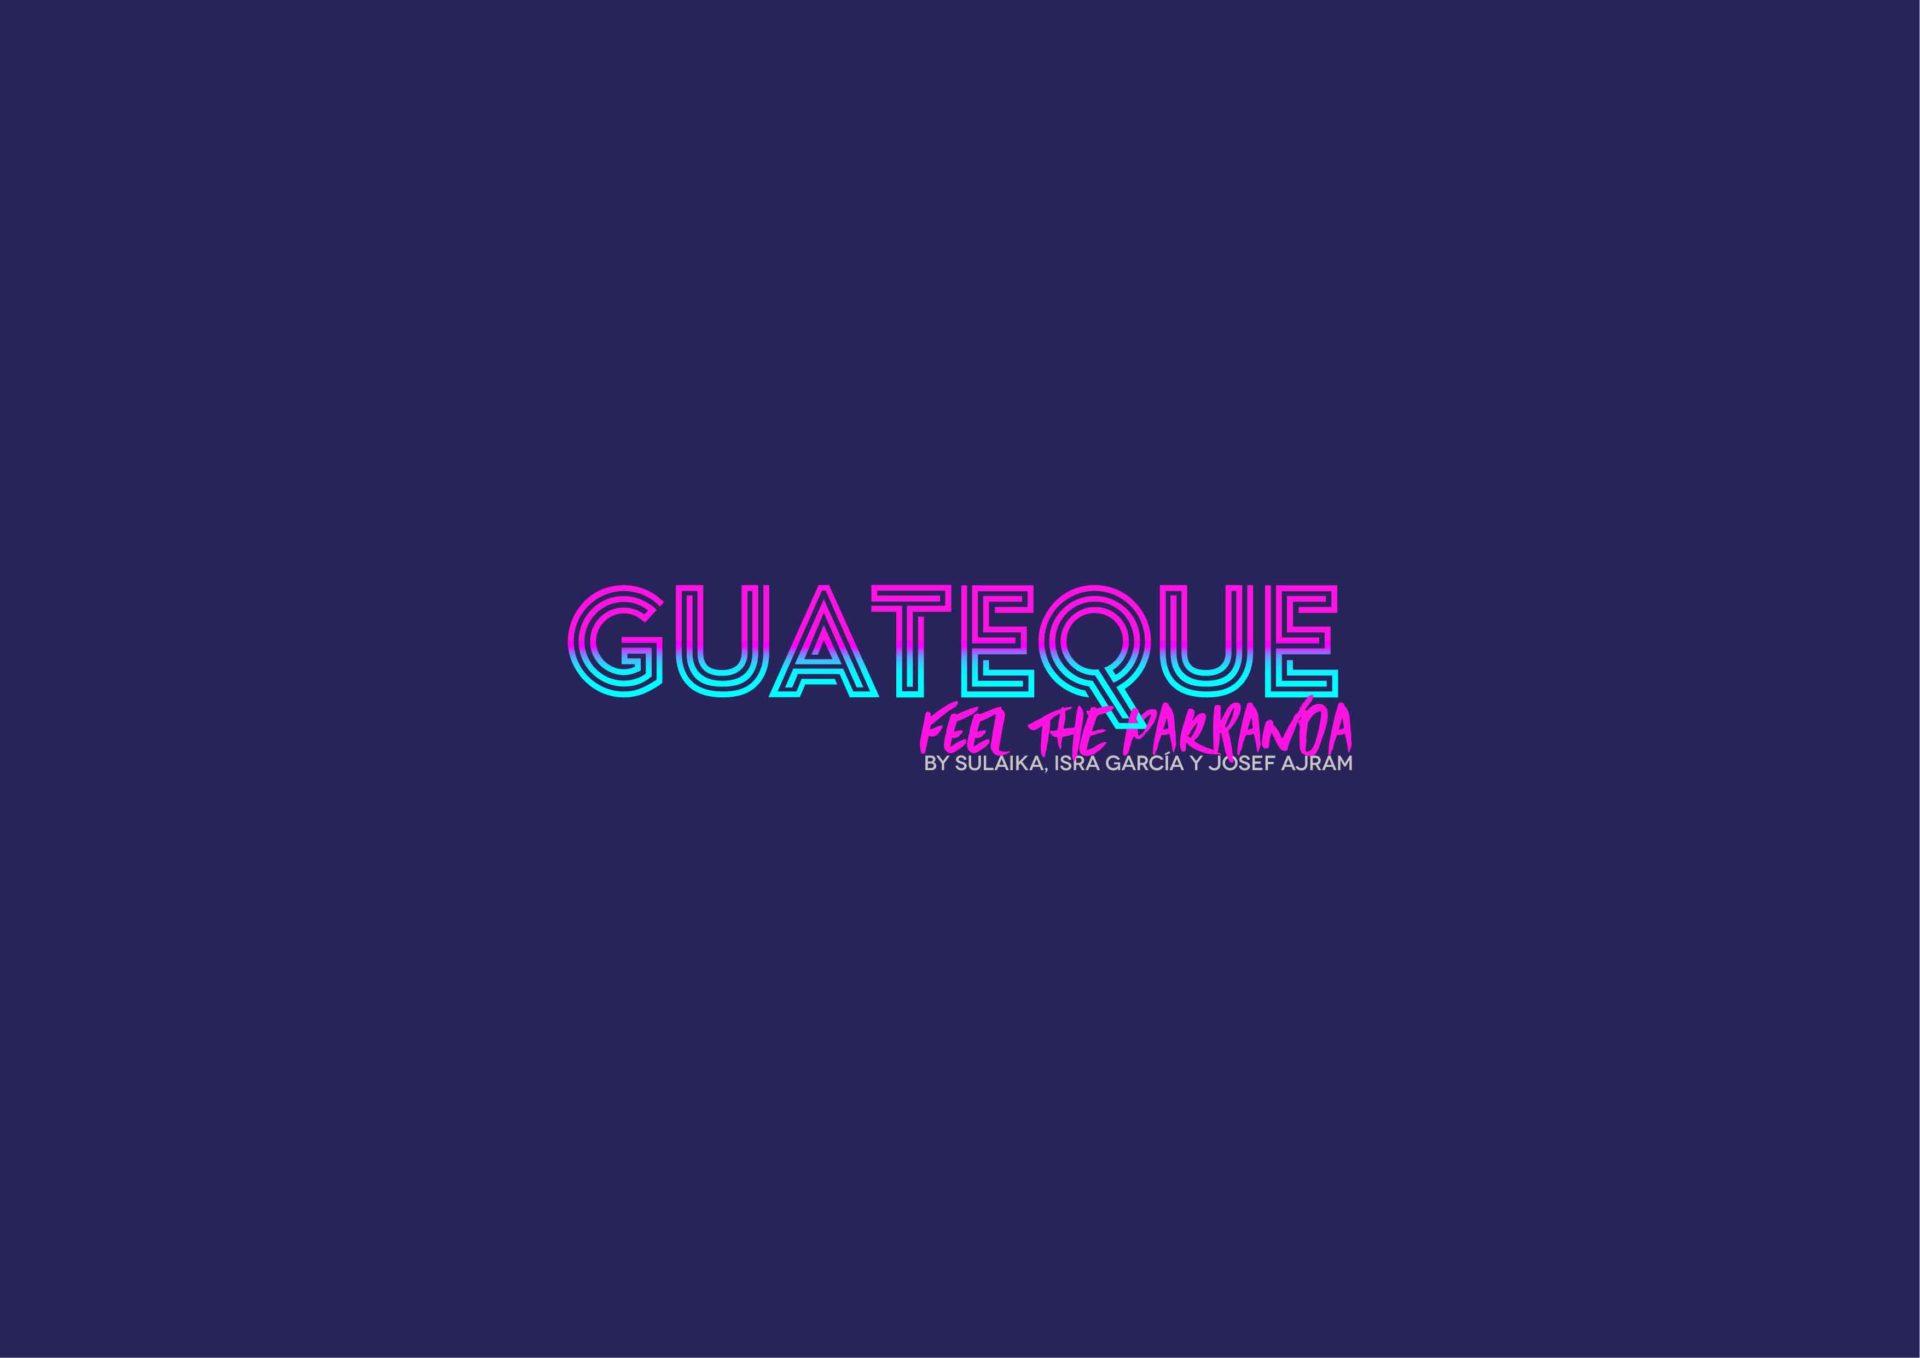 Guateque - Feel the Parranda. Opening Jarana.